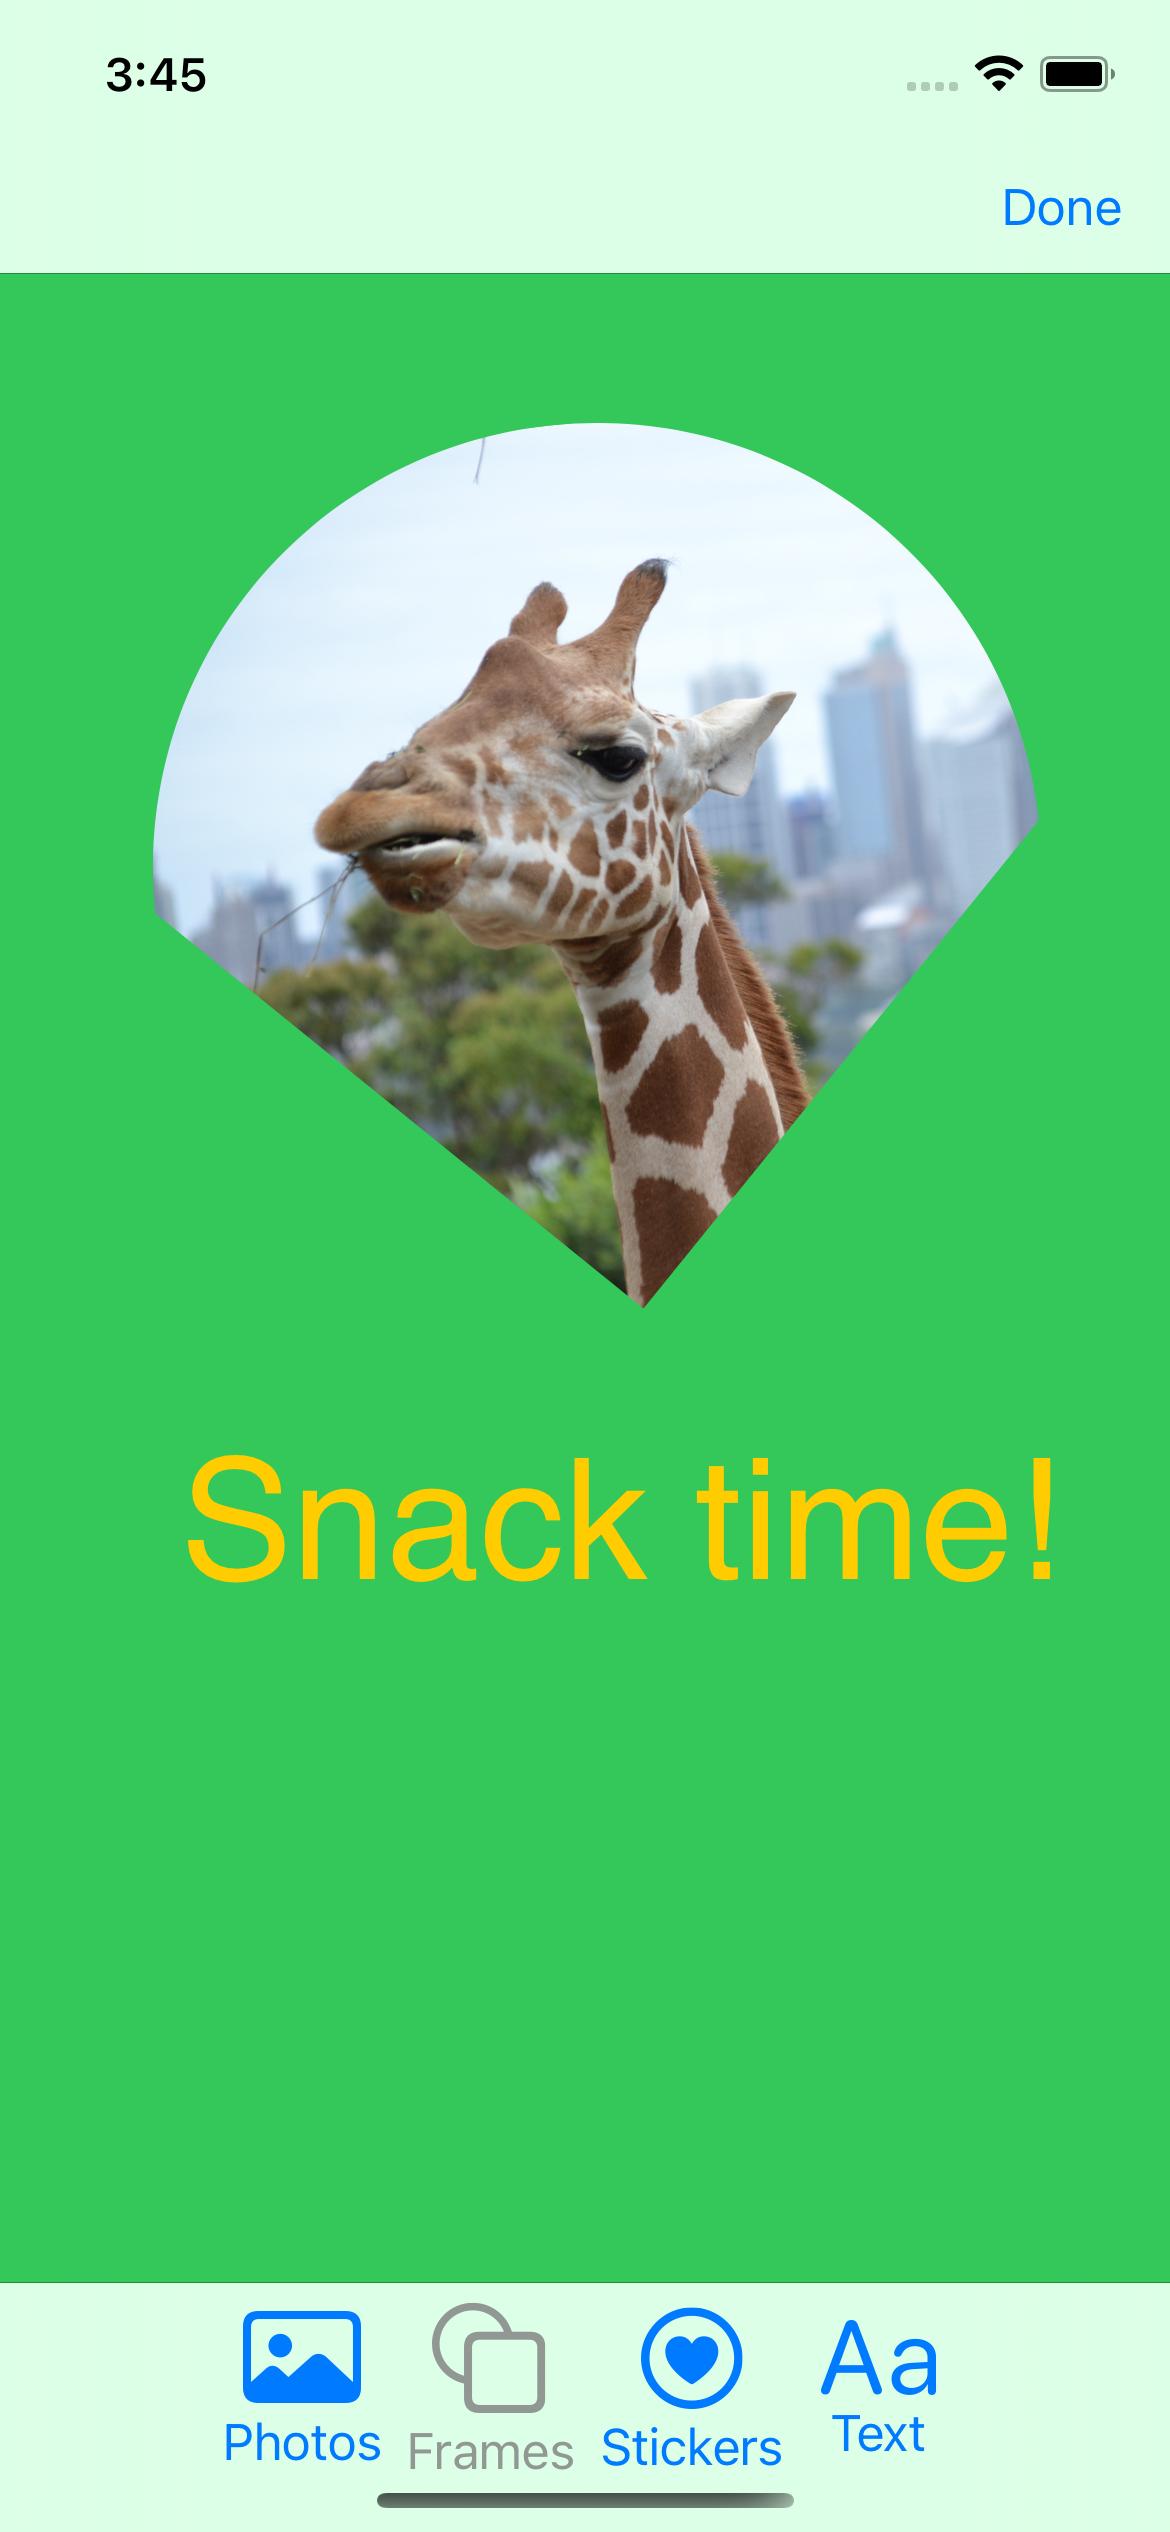 Clipped giraffe